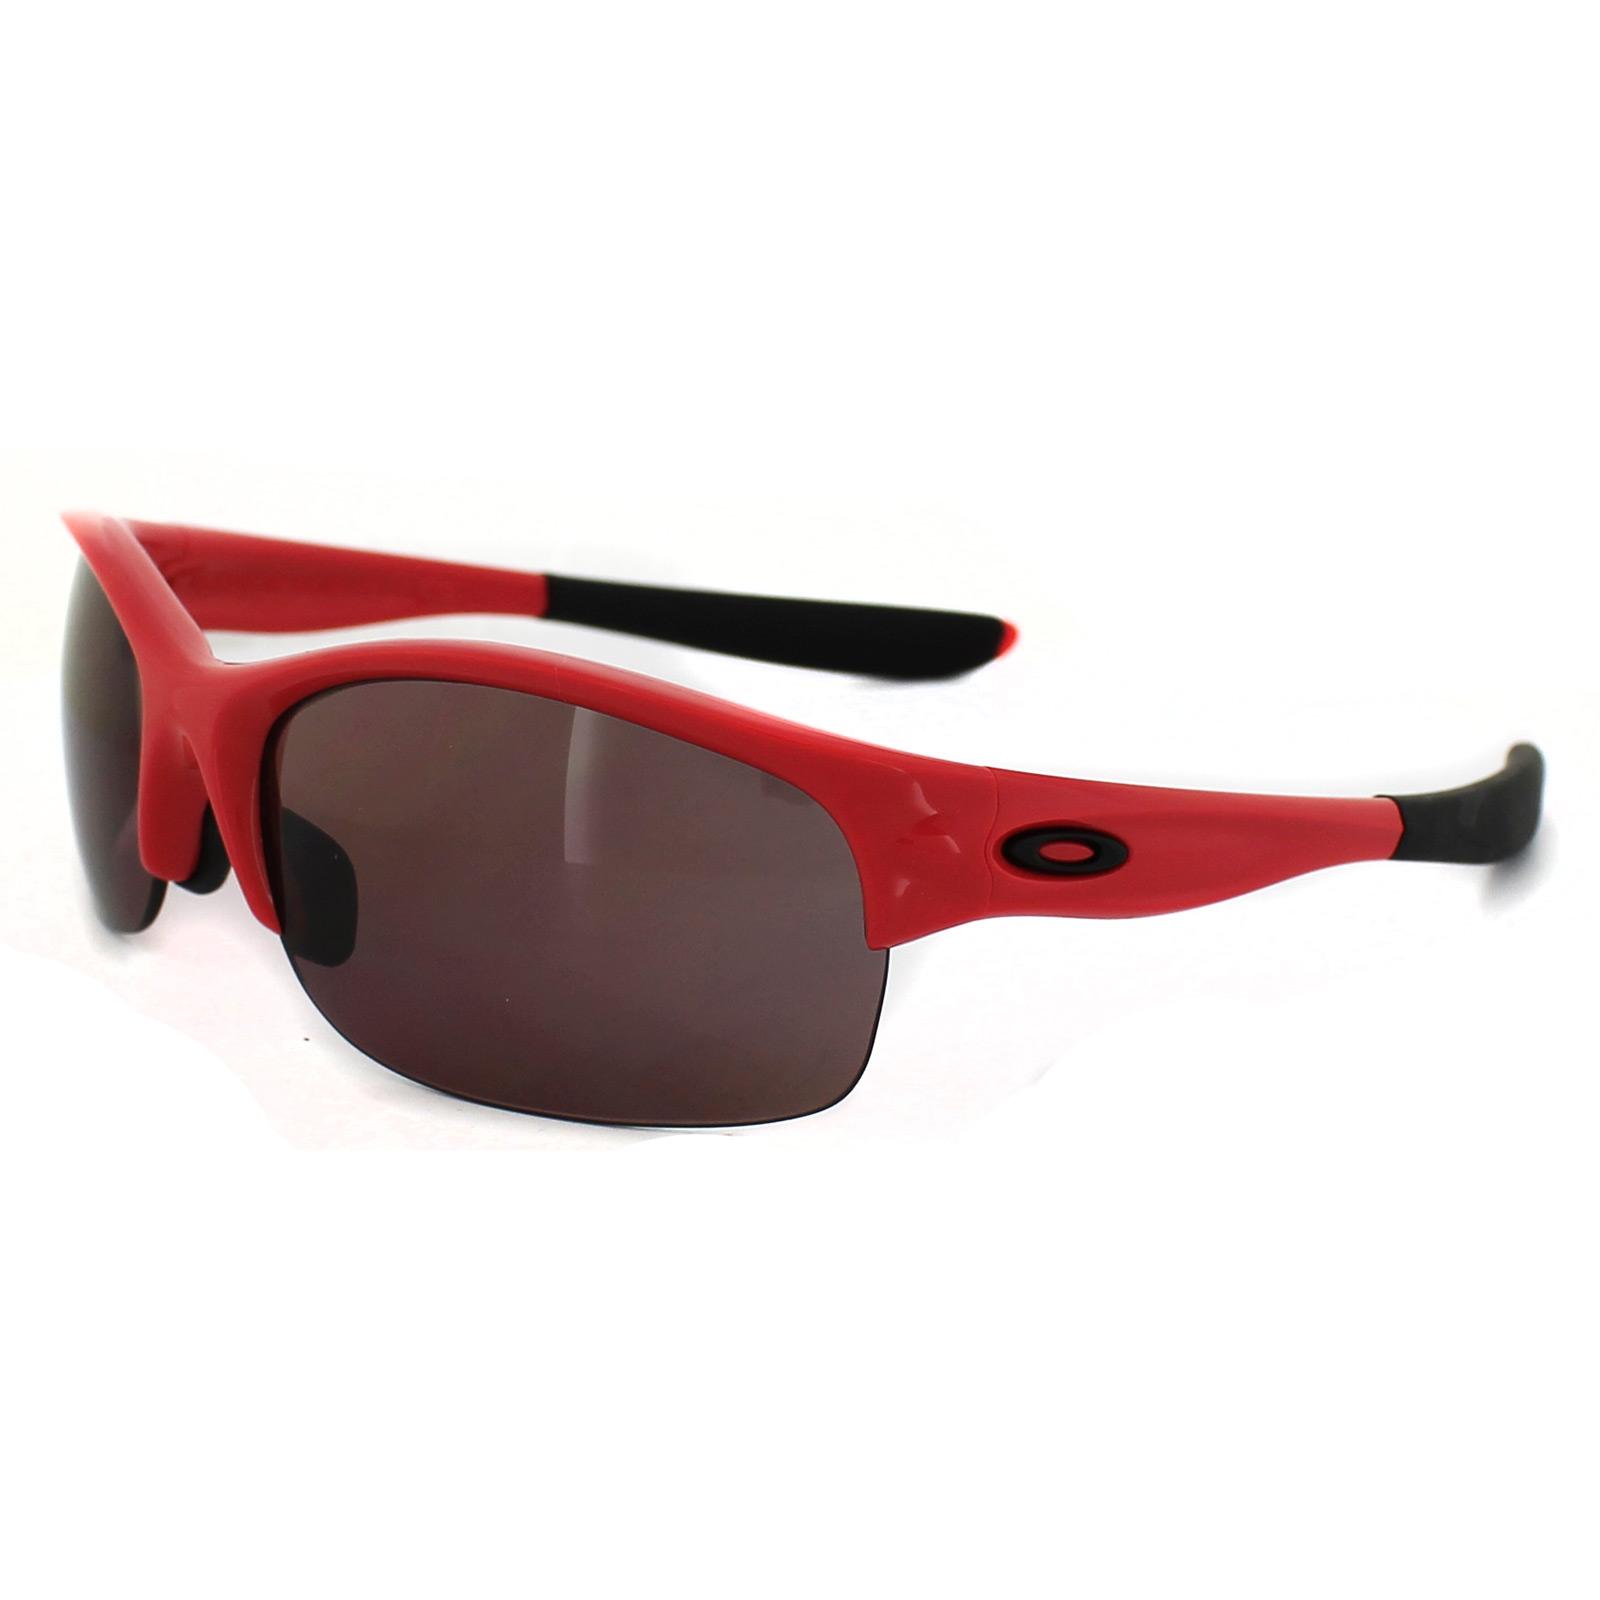 bd39402b8f2 Oakley Sunglasses Commit Sq « Heritage Malta